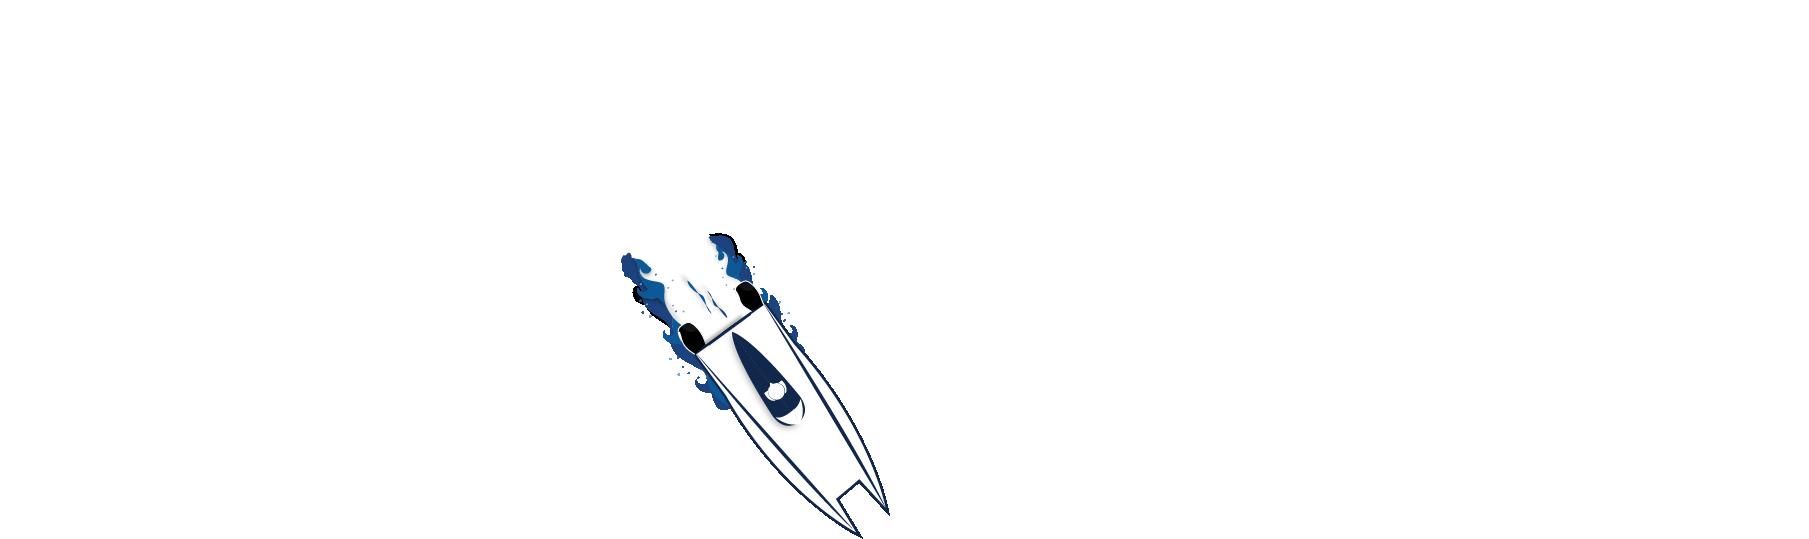 Tvedestrand Racing Klubb